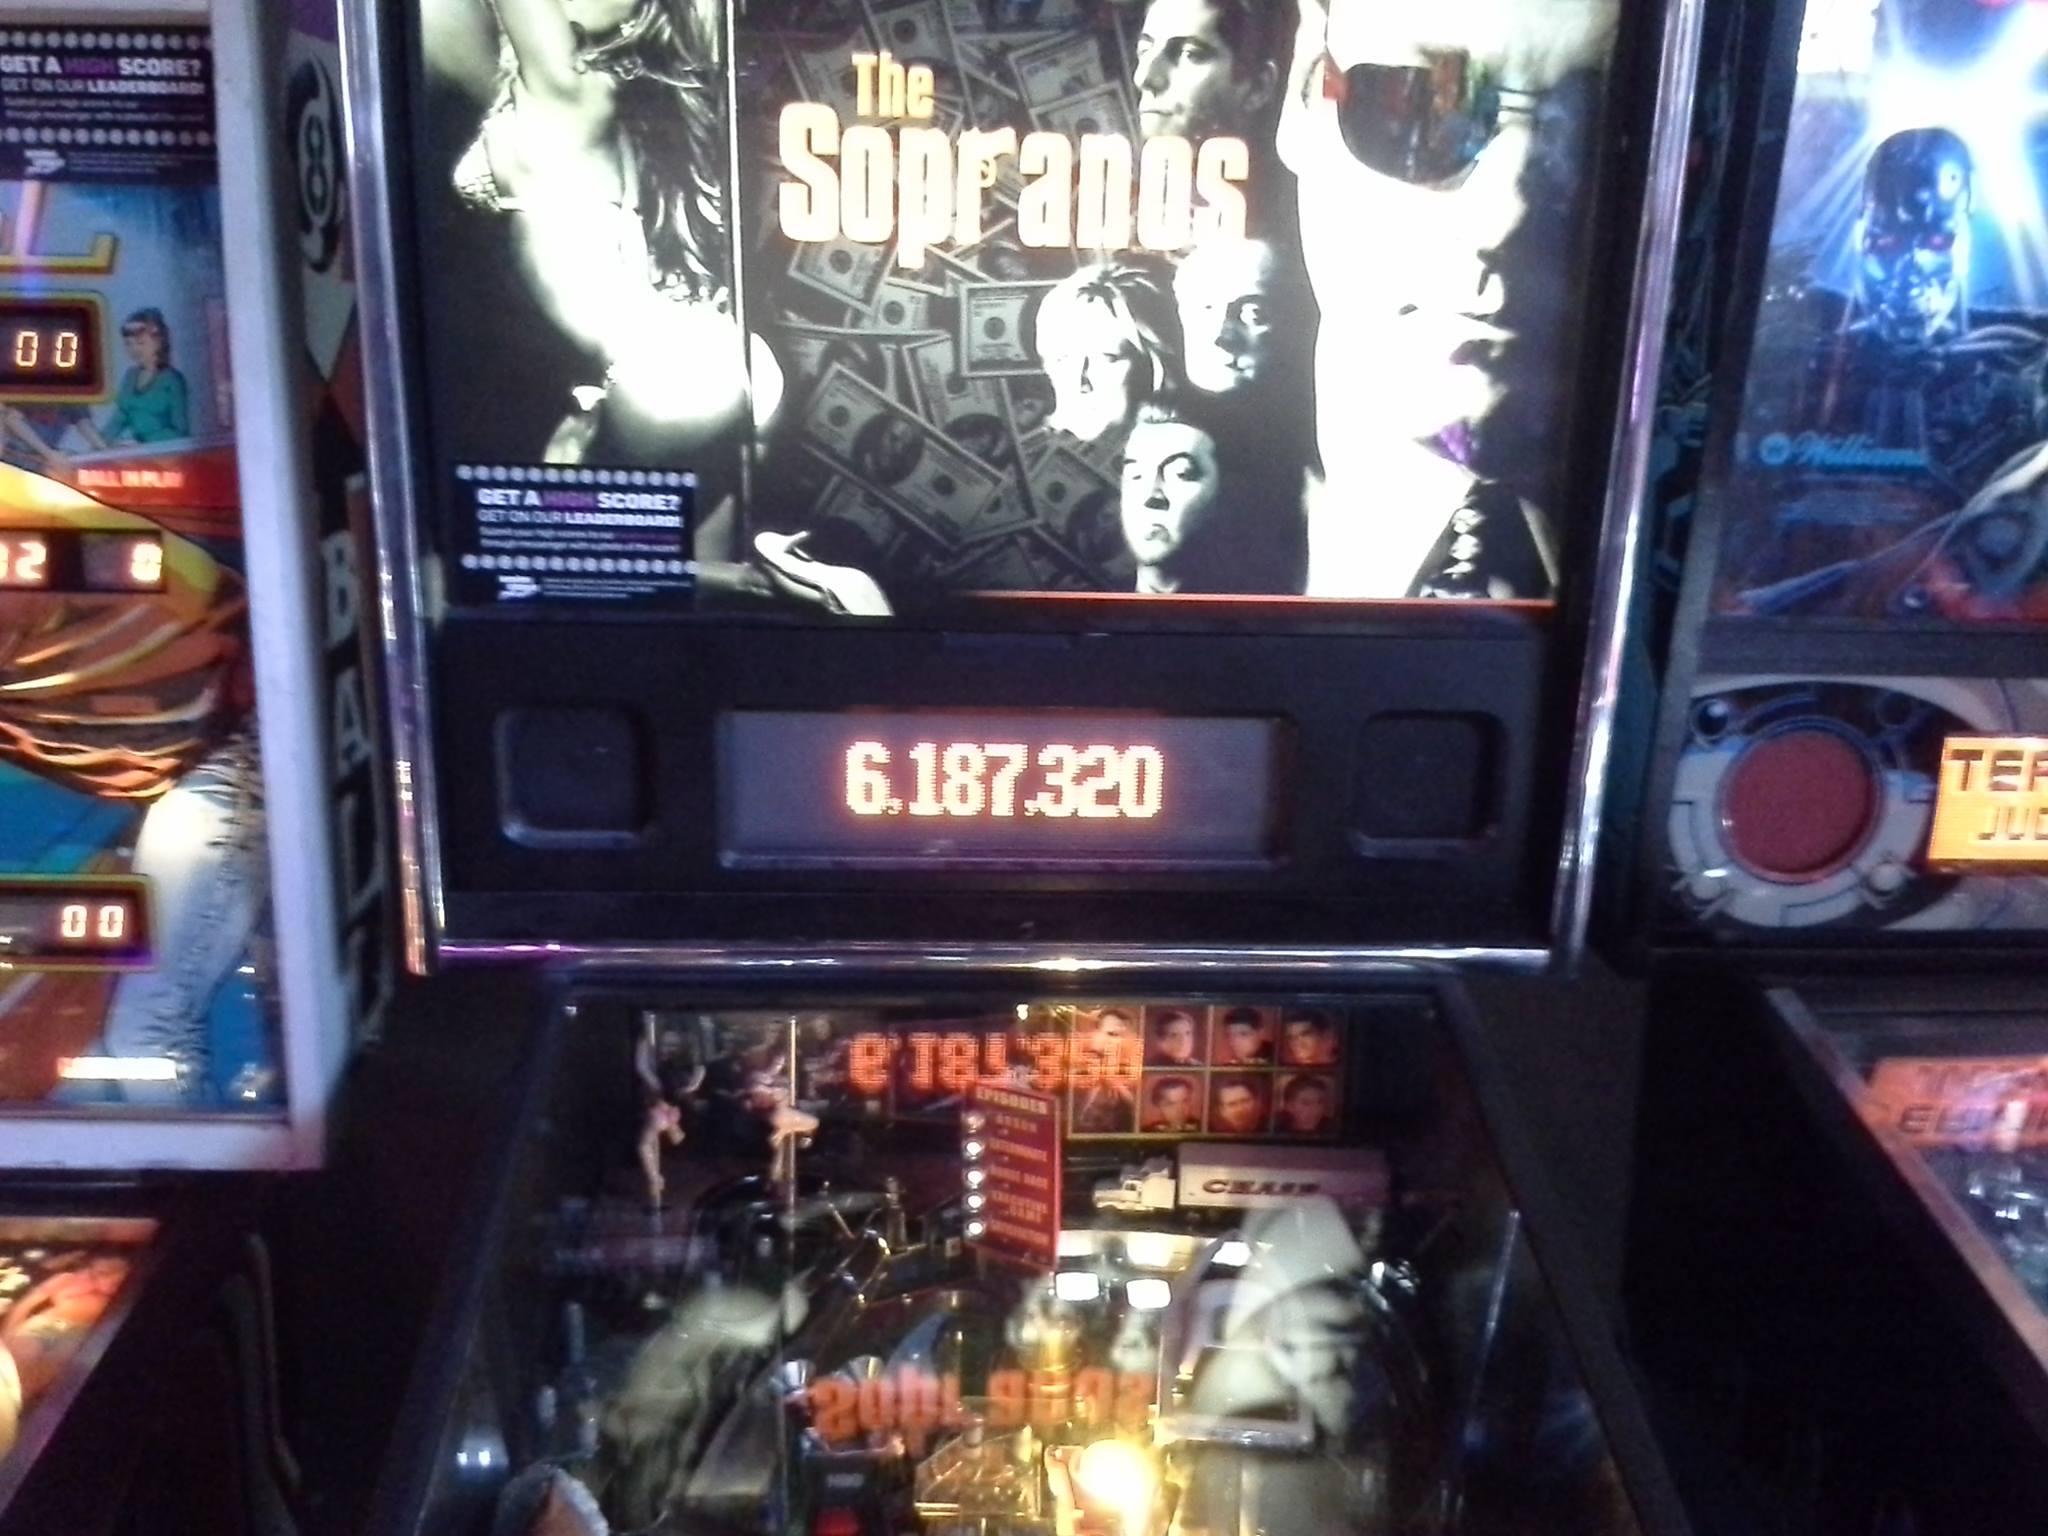 The Sopranos 6,187,320 points